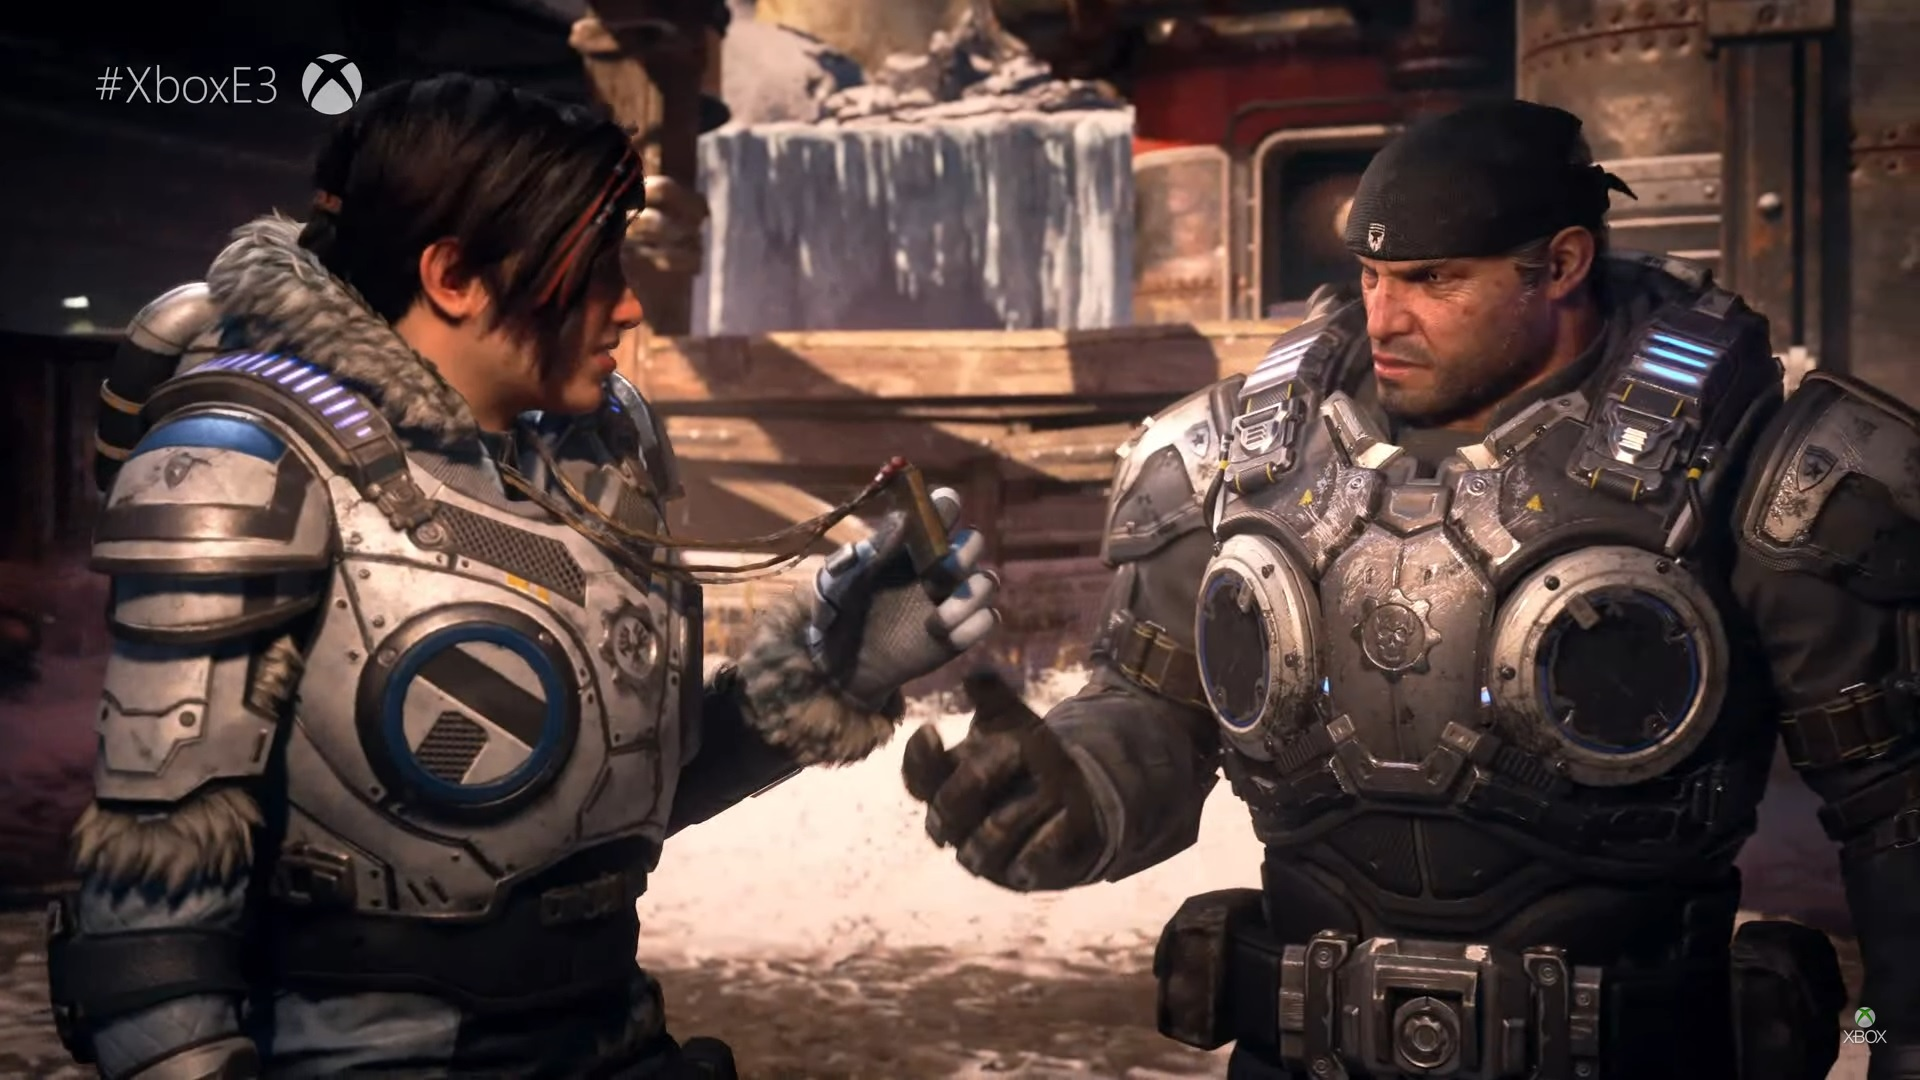 Gears Of War 5 Announced At Xbox E3 2018